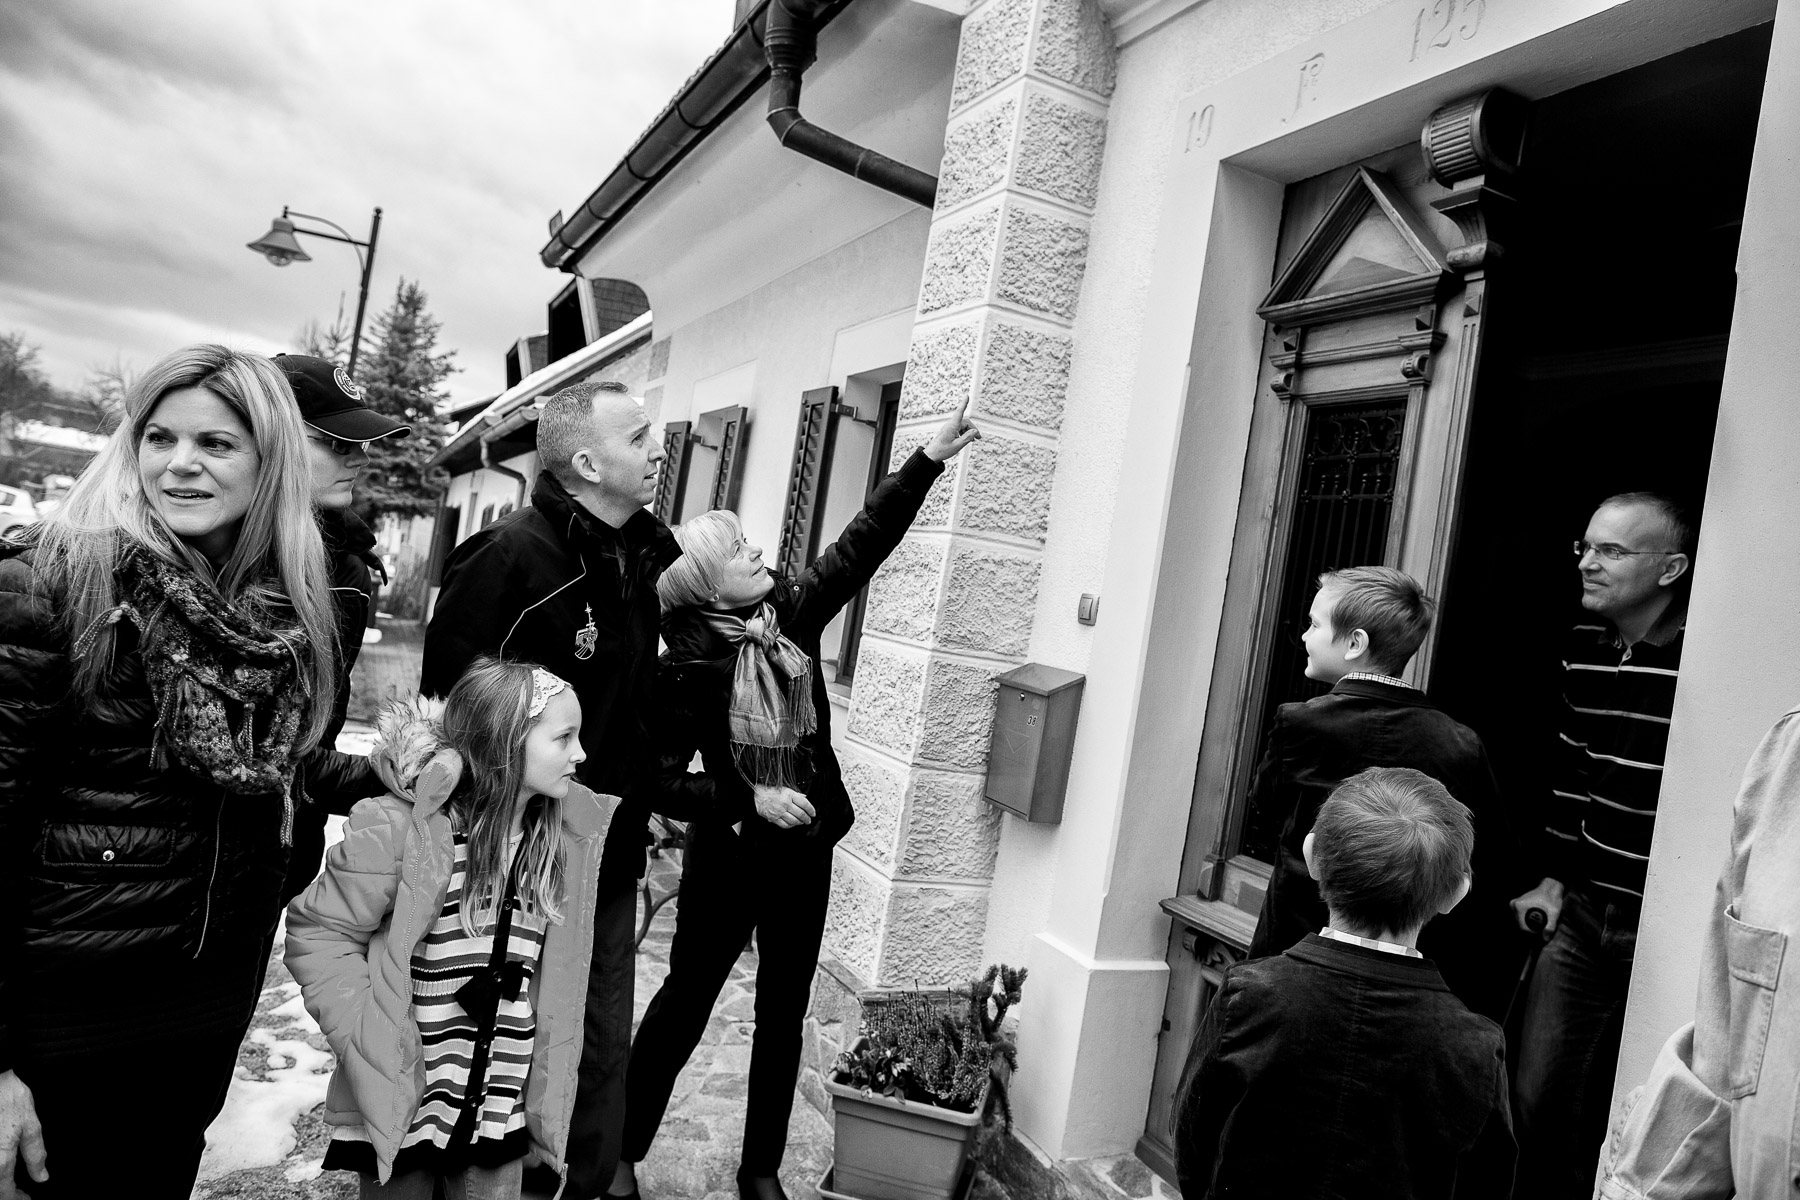 The Bresnik family visit the house where Randy's great-grandmother lived in Ljubno, Slovenia.